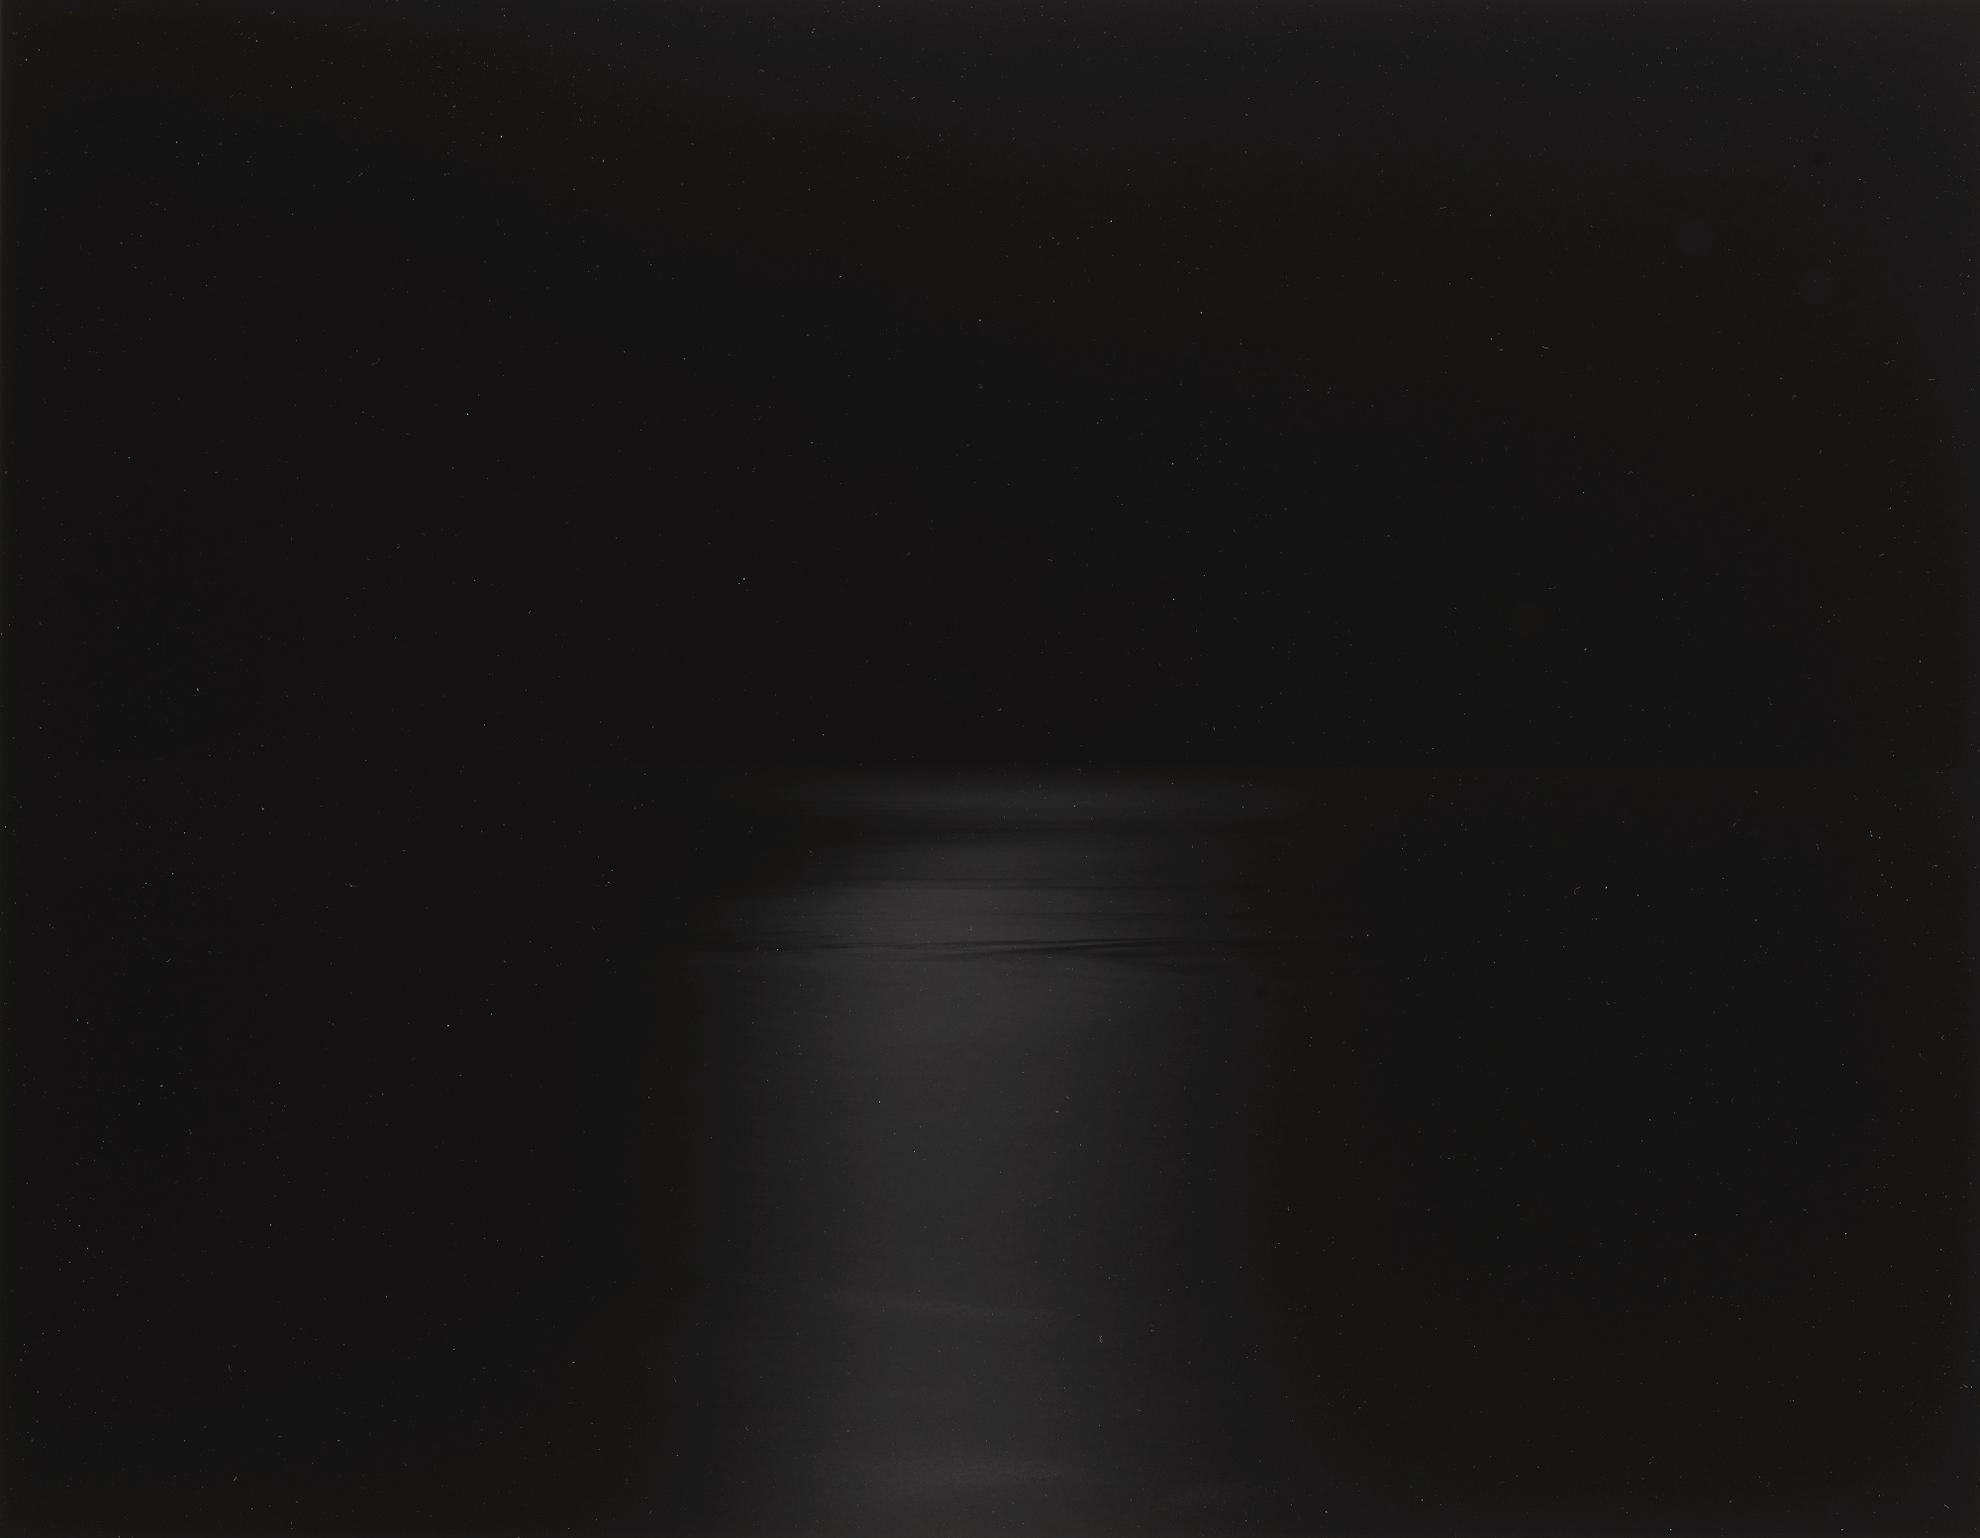 Hiroshi Sugimoto-Ionian Sea, Santa Cesarea-1993